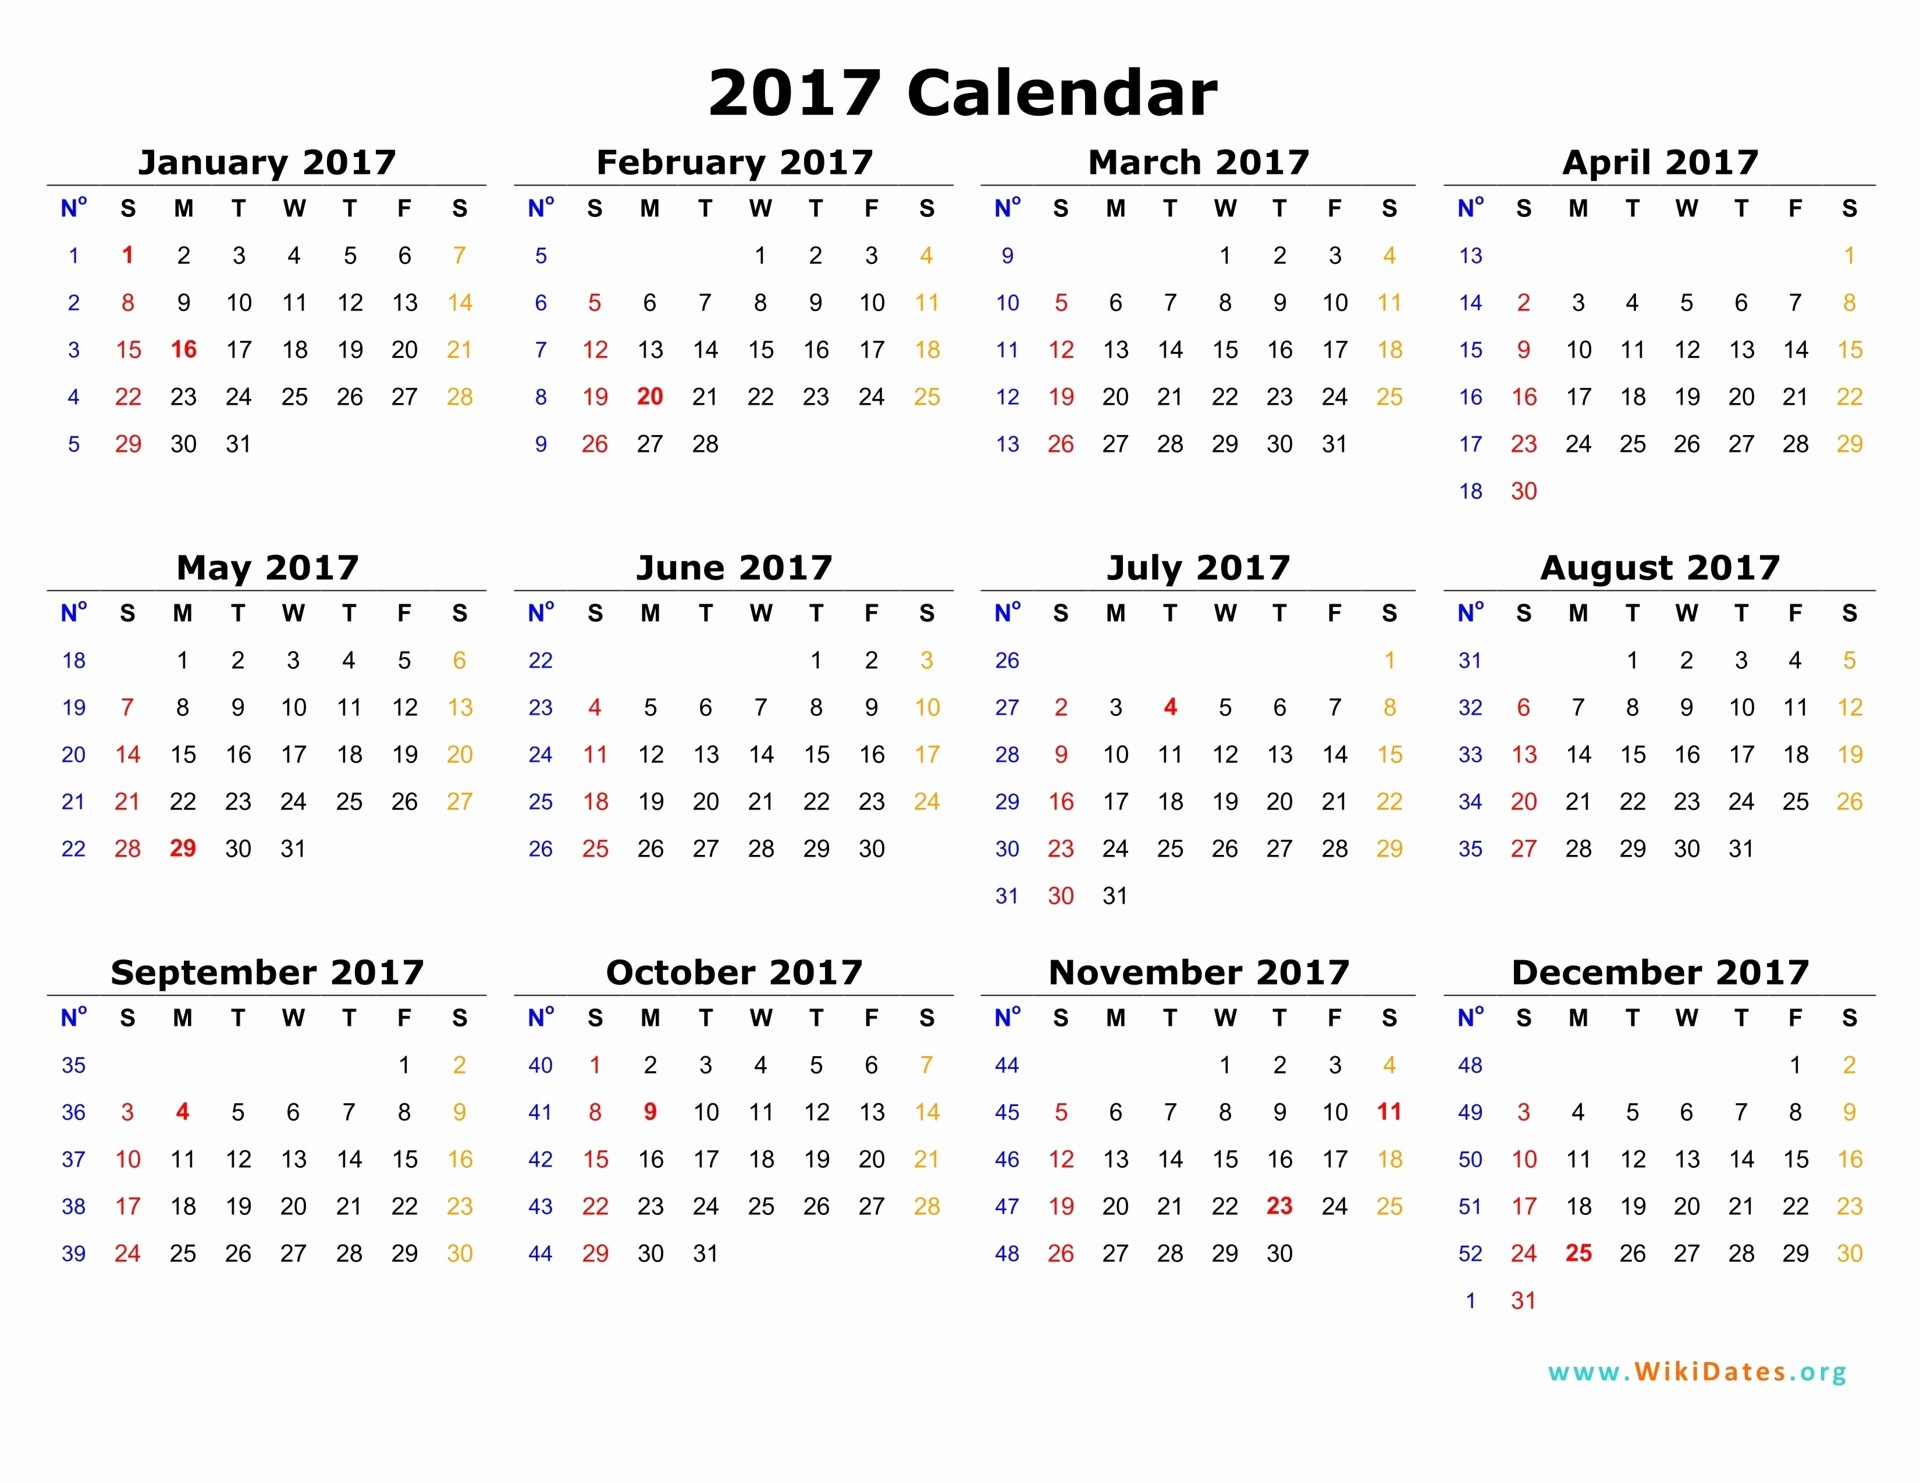 2017 Calendar with Holidays Template New 2017 Calendar